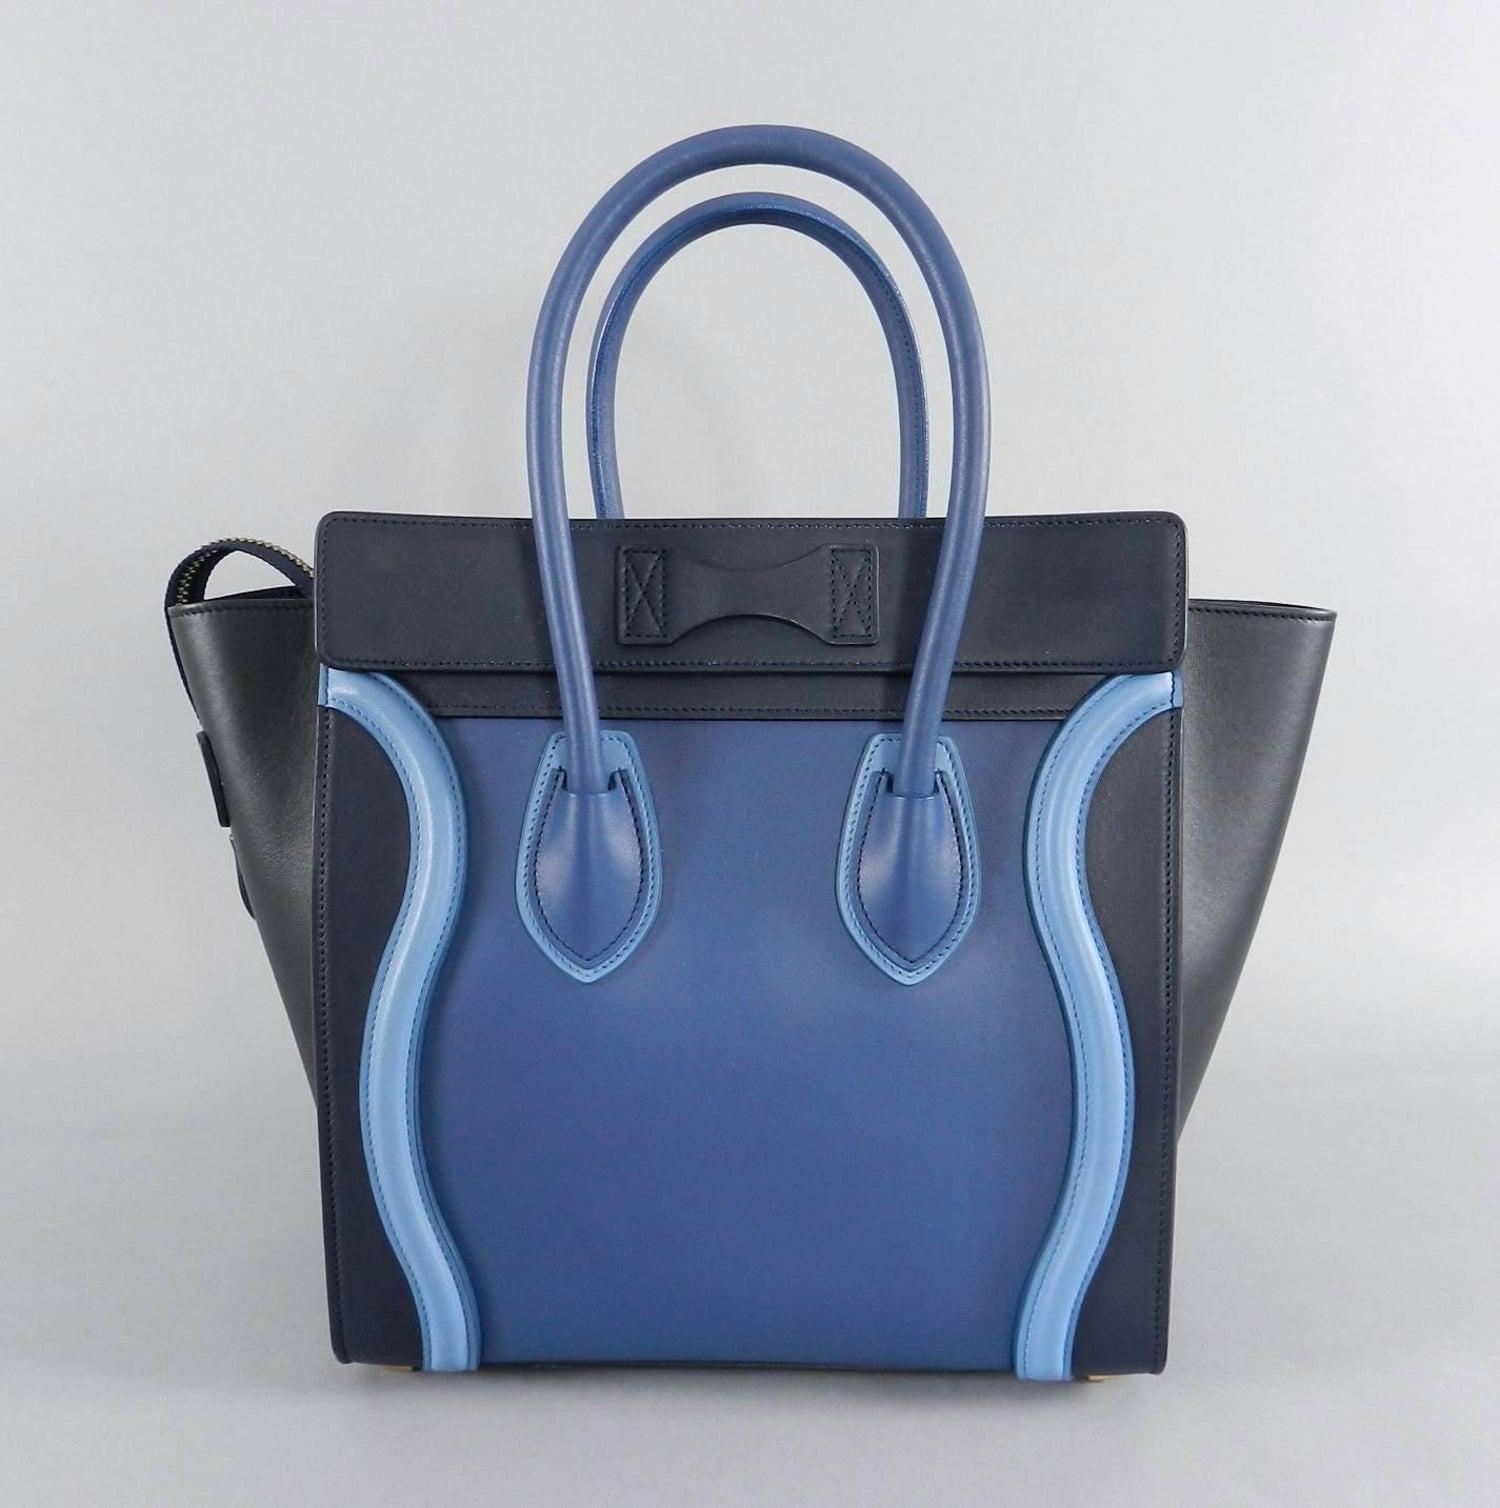 7a874fdb61 Celine Micro Luggage Phantom Bag - Tri tone Blue at 1stdibs